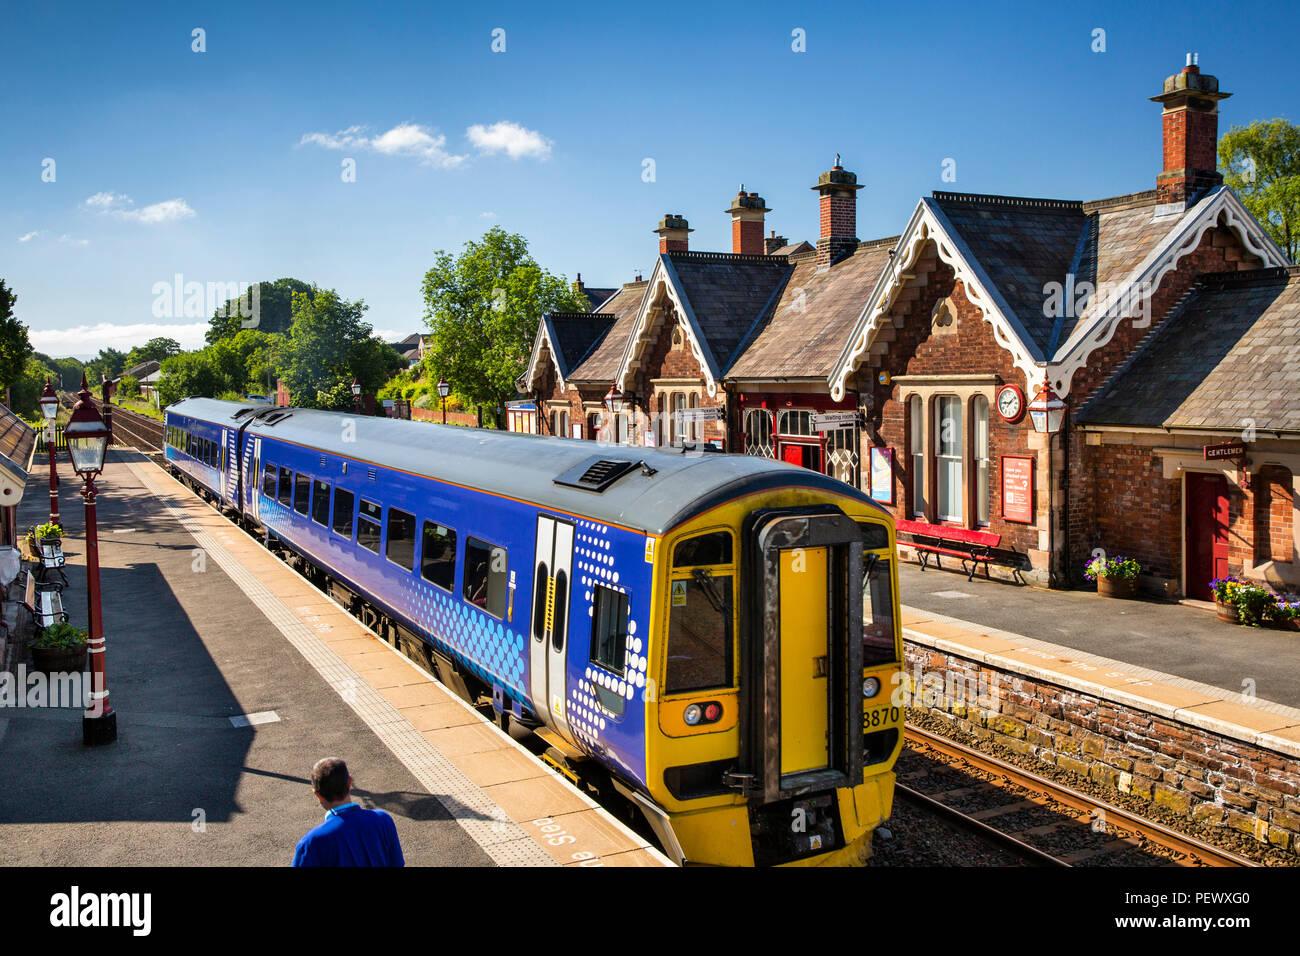 UK, Cumbria, Eden Valley, Appleby Station on Settle to Carlisle Line, Northern Rail train at southbound platform - Stock Image